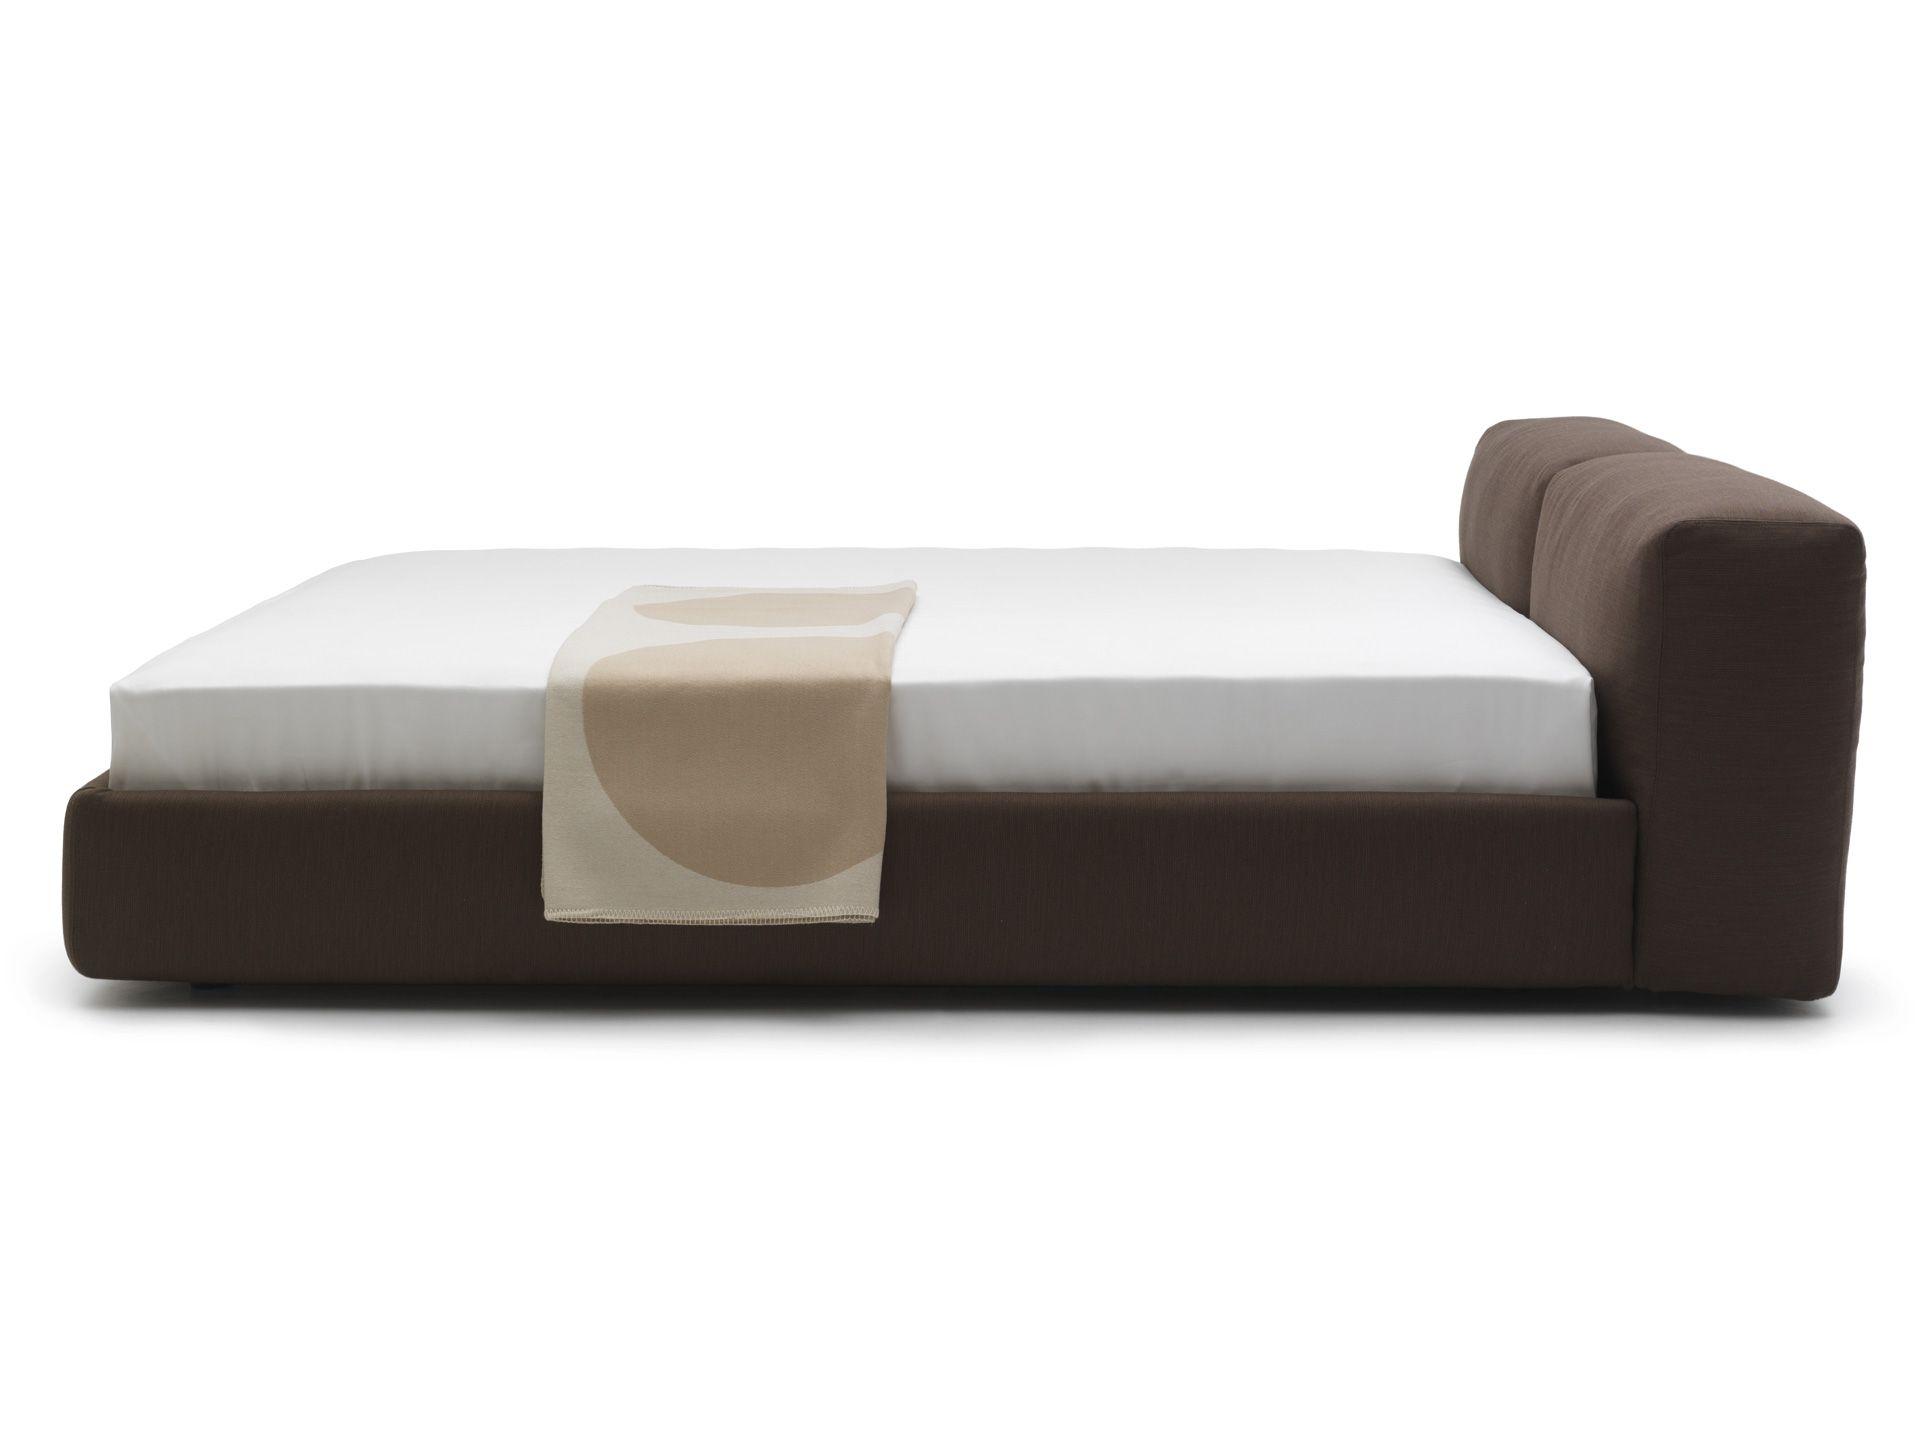 CAPPELLINI - SUPEROBLONG BED, DESIGN JASPER MORRISON | Bed 床 ...